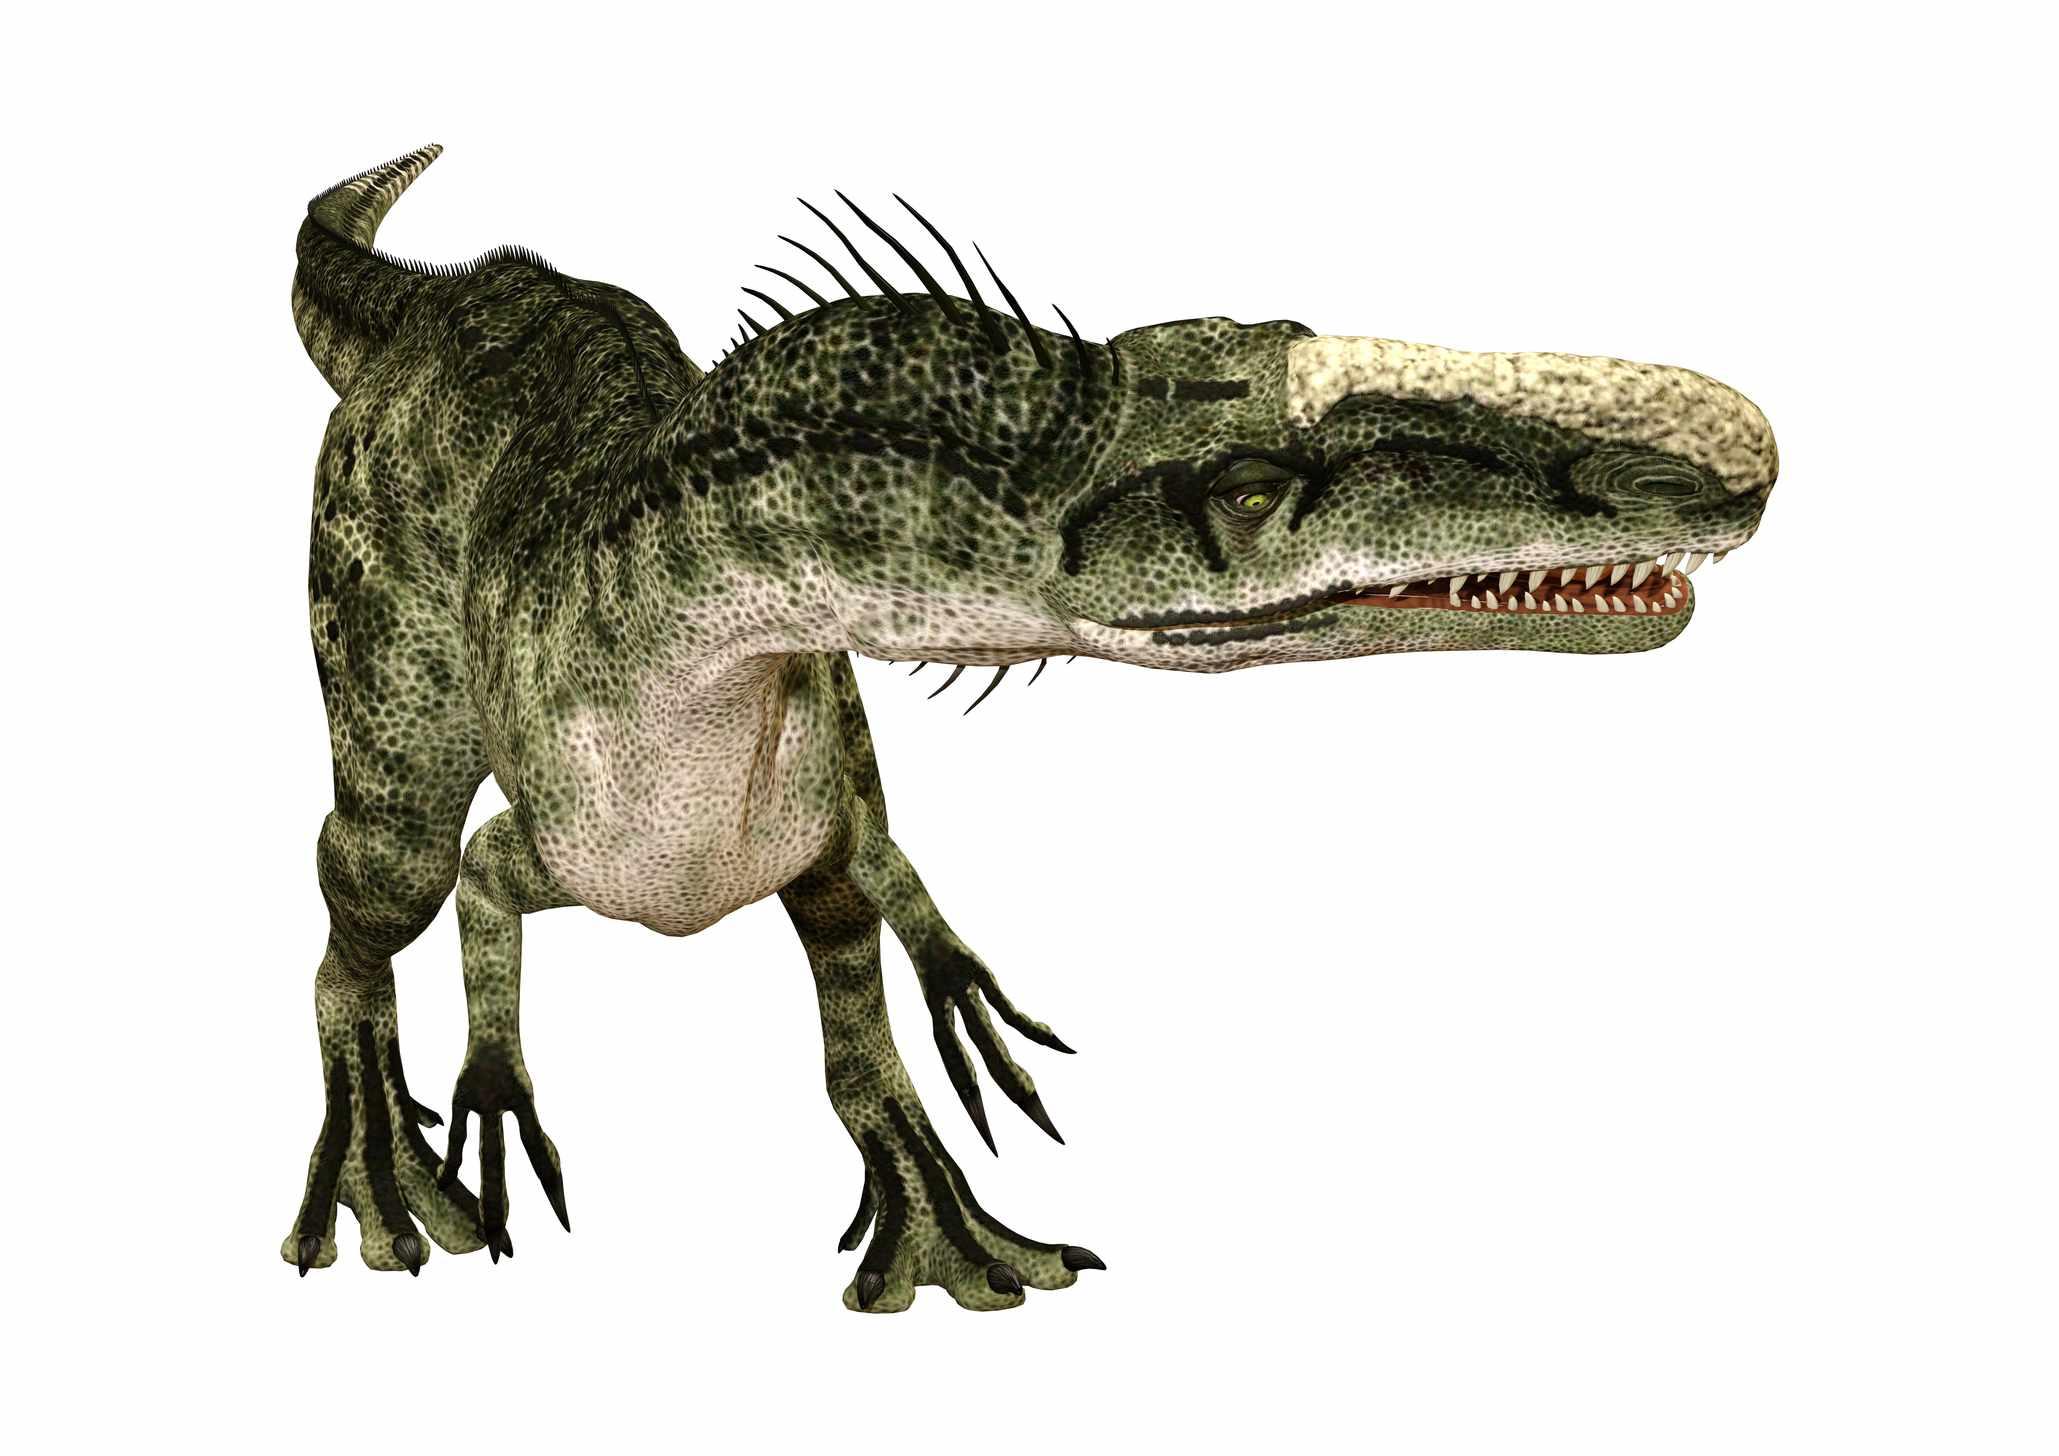 graphic rendering of monolophosaurus